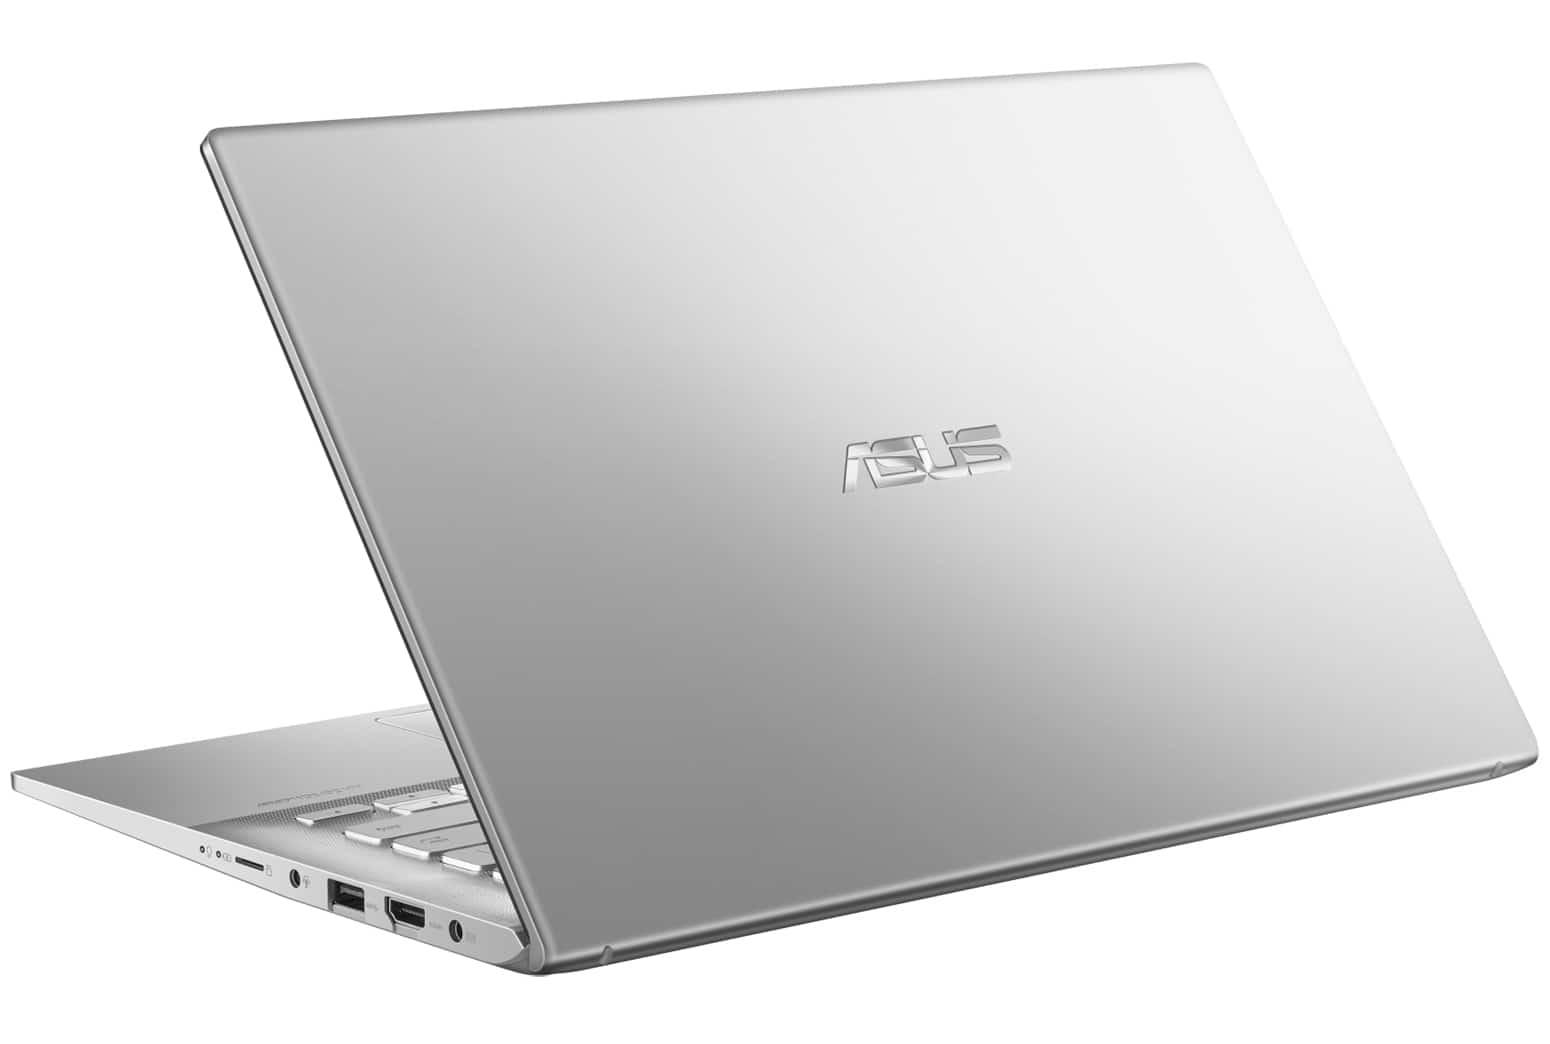 "Asus S412DK-EK014T, ultrabook 14"" design Radeon RX540 (559€)"